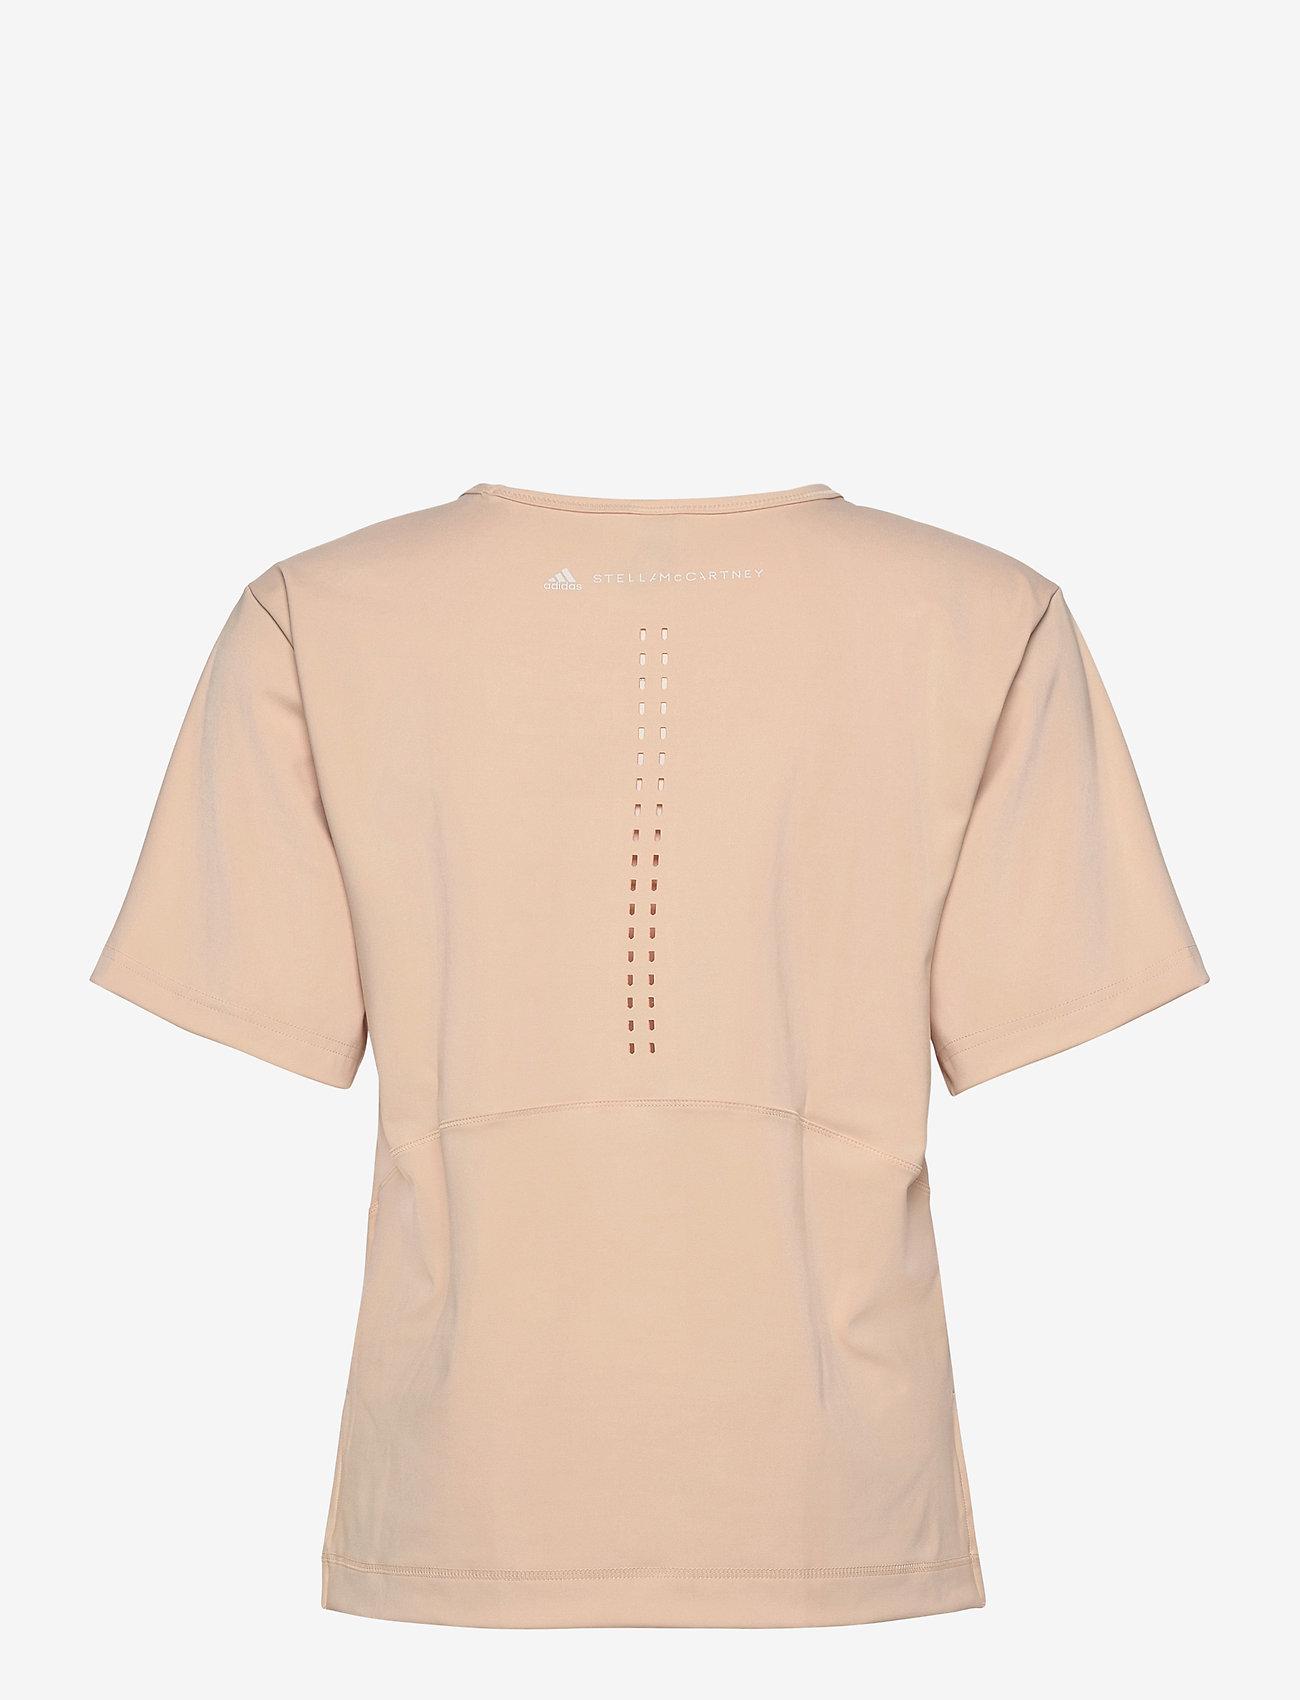 adidas by Stella McCartney - TRUESTR L TEE - t-shirts - sofpow - 2